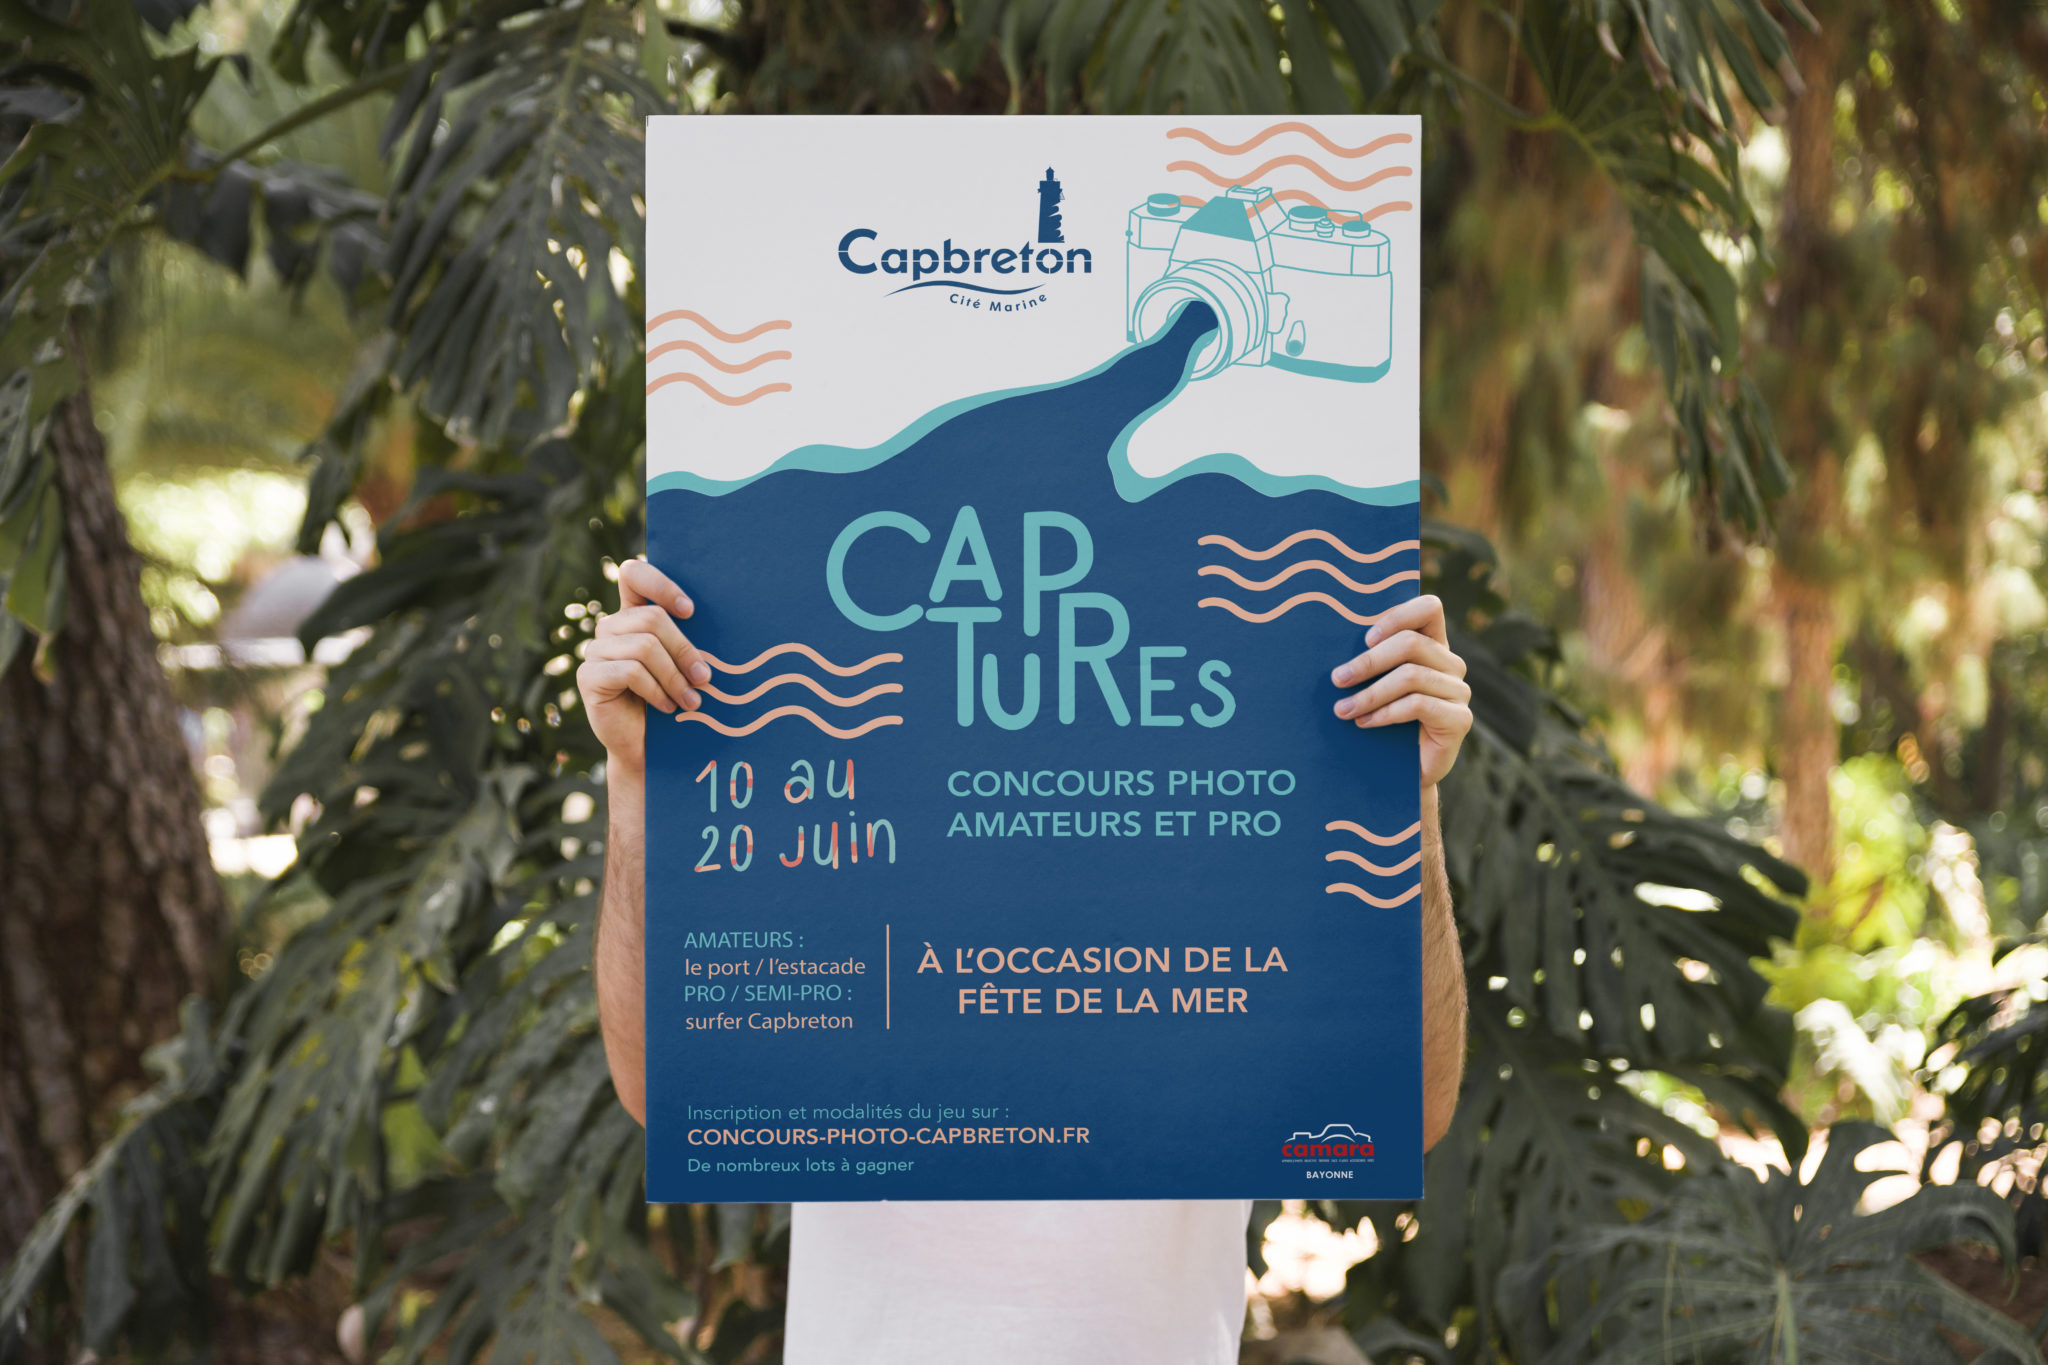 concours photo capbreton